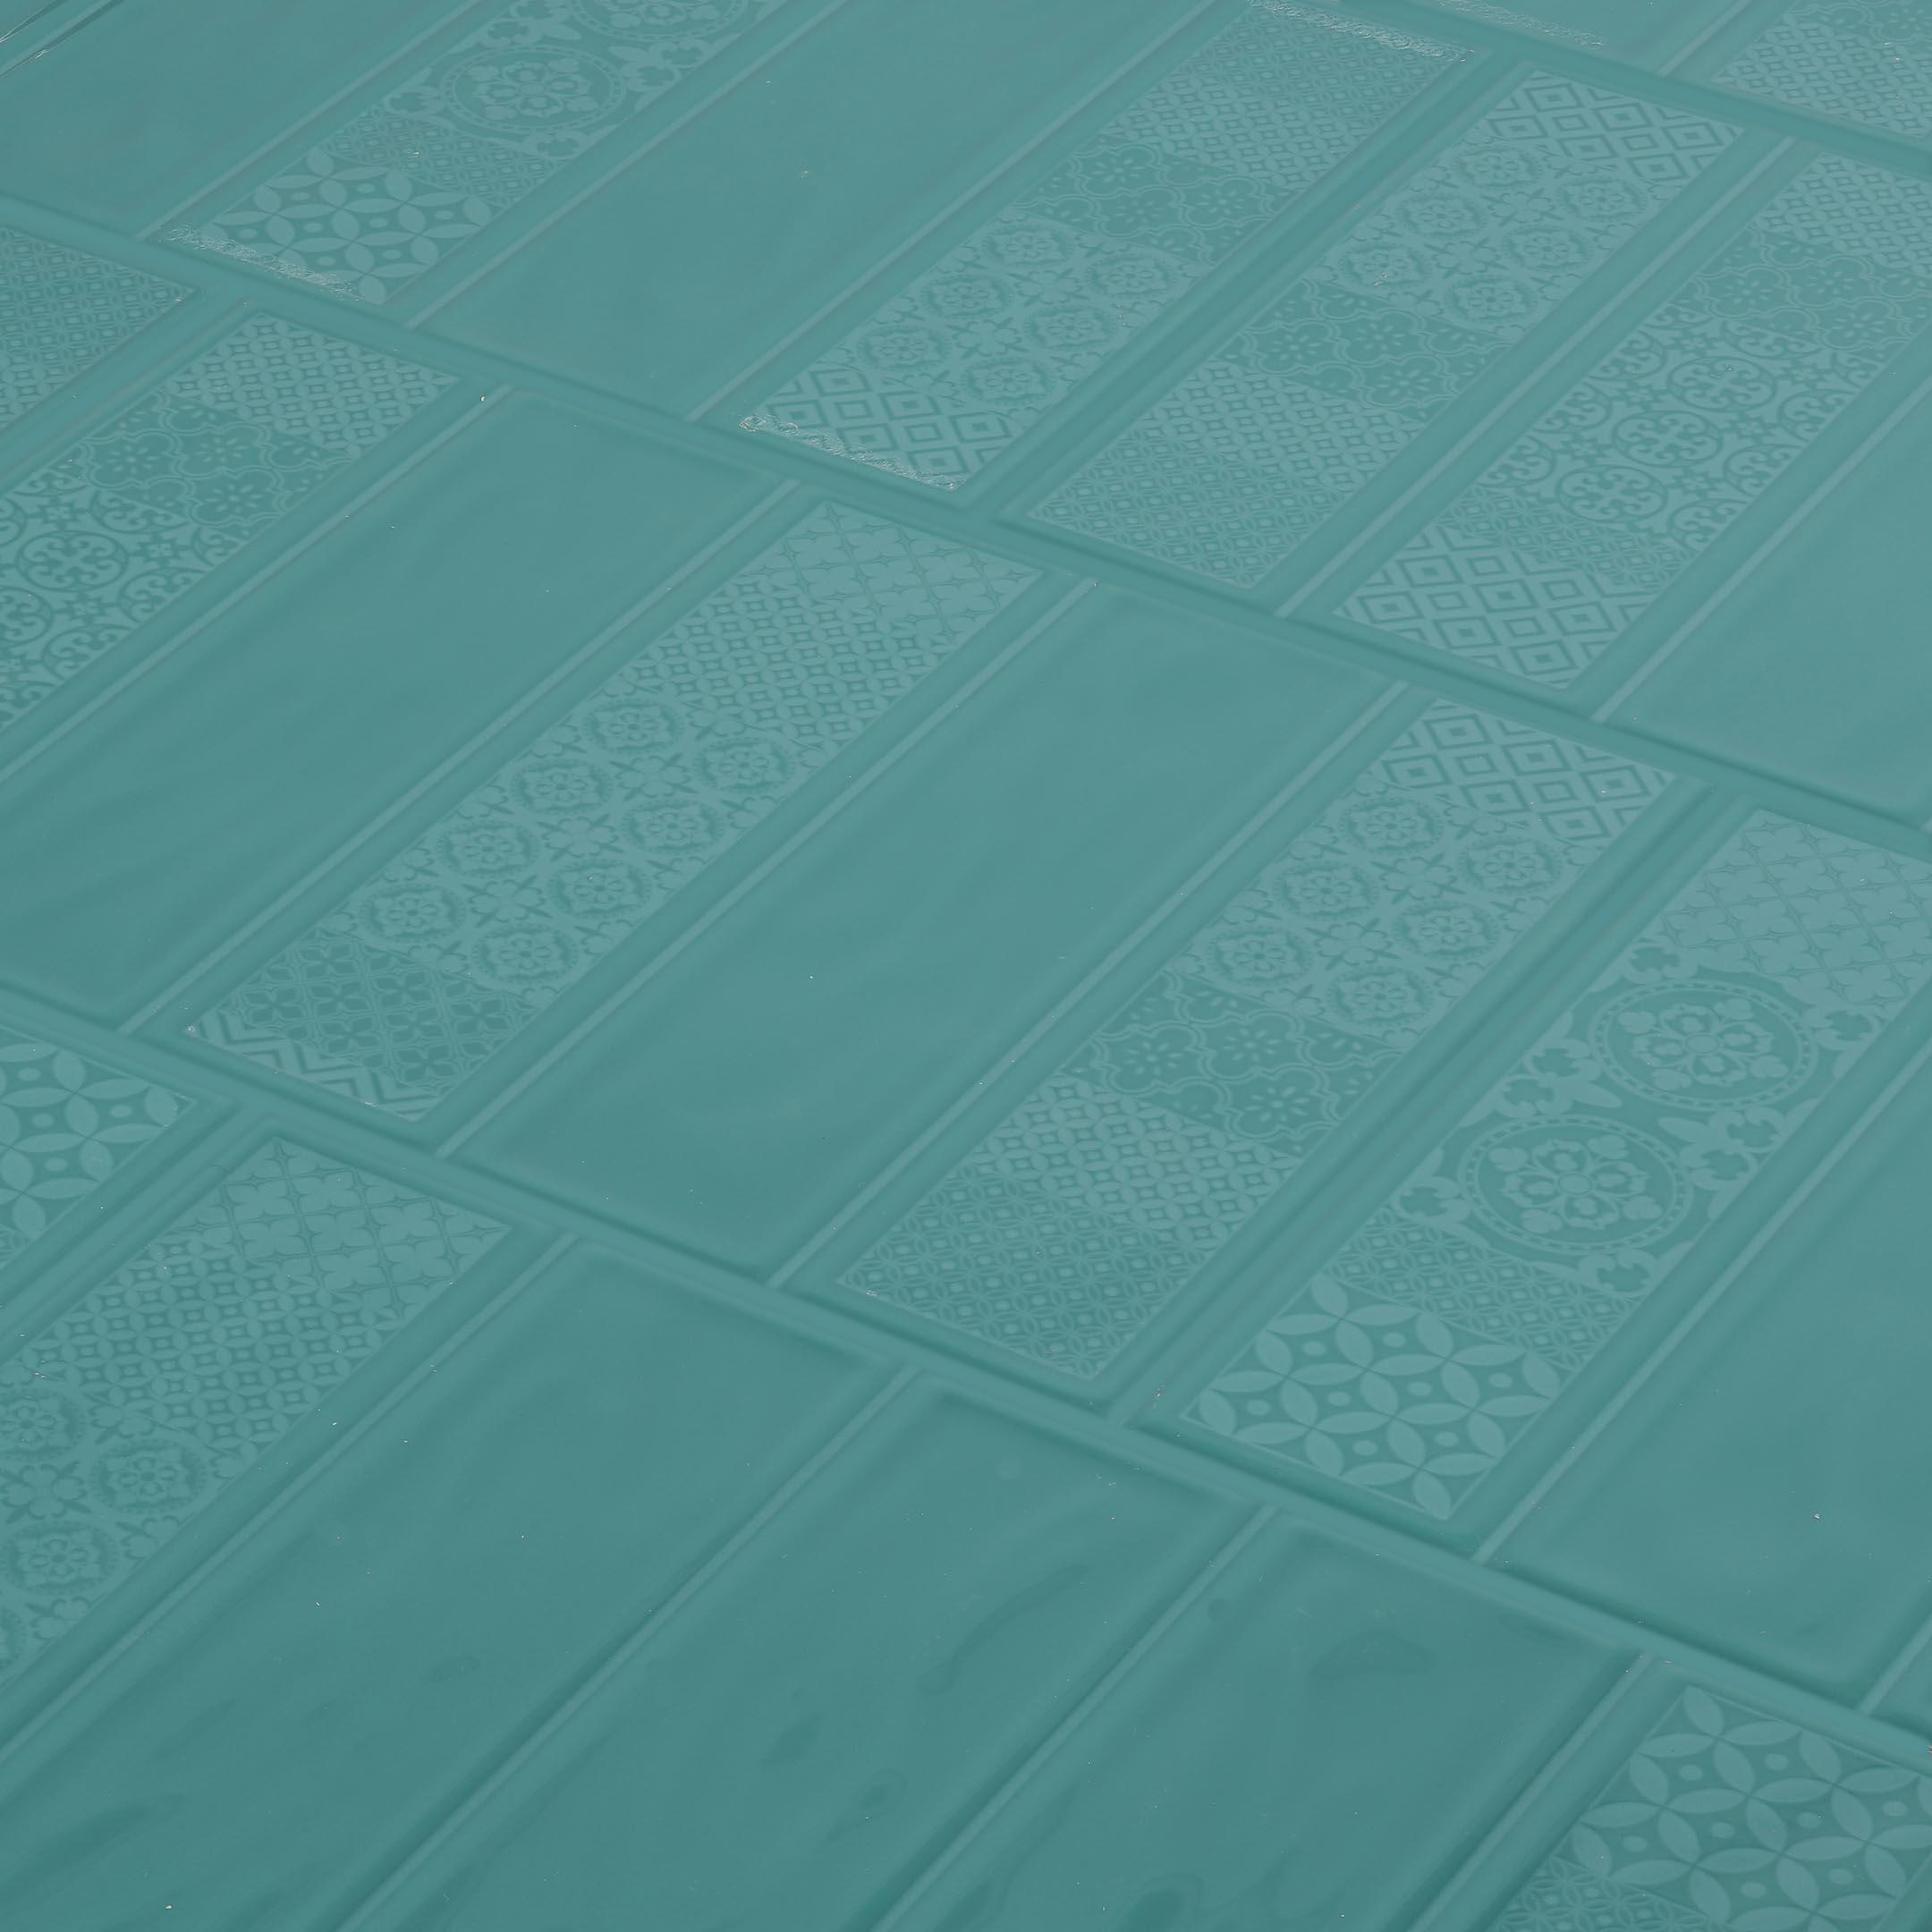 Плитка облицовочная Керамин Метро 4Д зеленый 275x400x7,5 мм (15 шт.=1,65 кв.м)